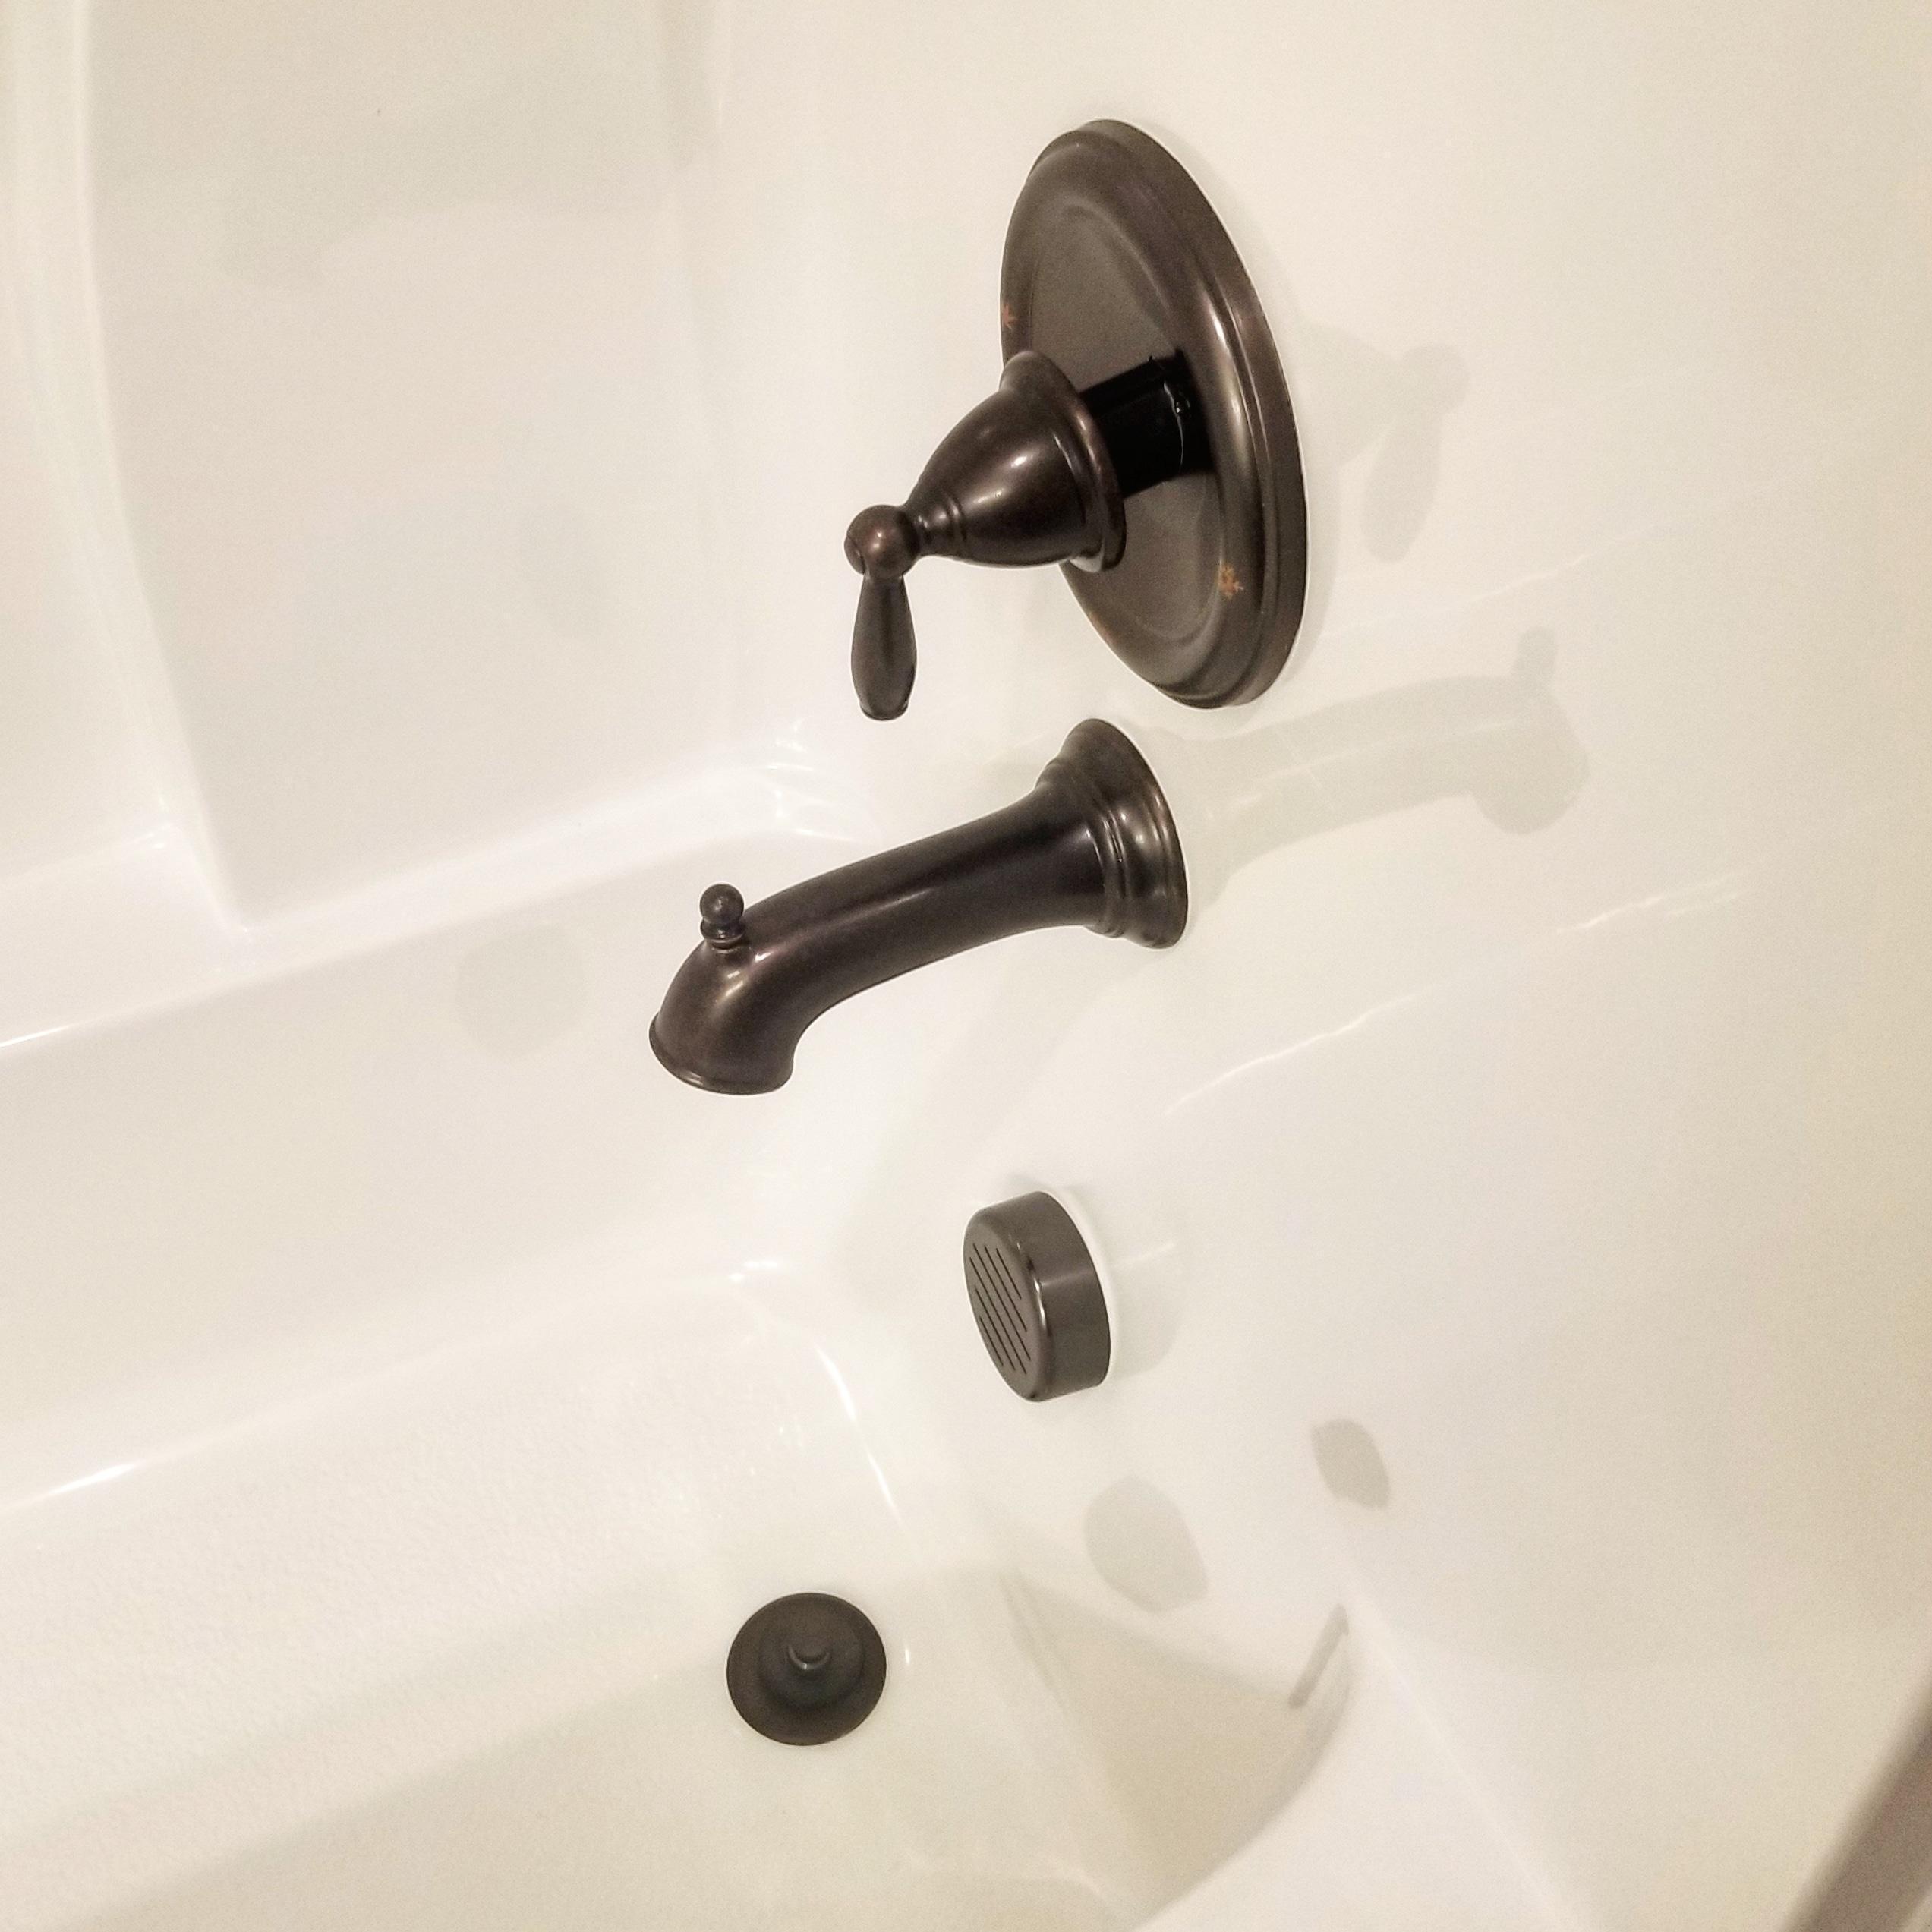 Bathroom featured in the Walton By Konter Quality Homes in Savannah, GA